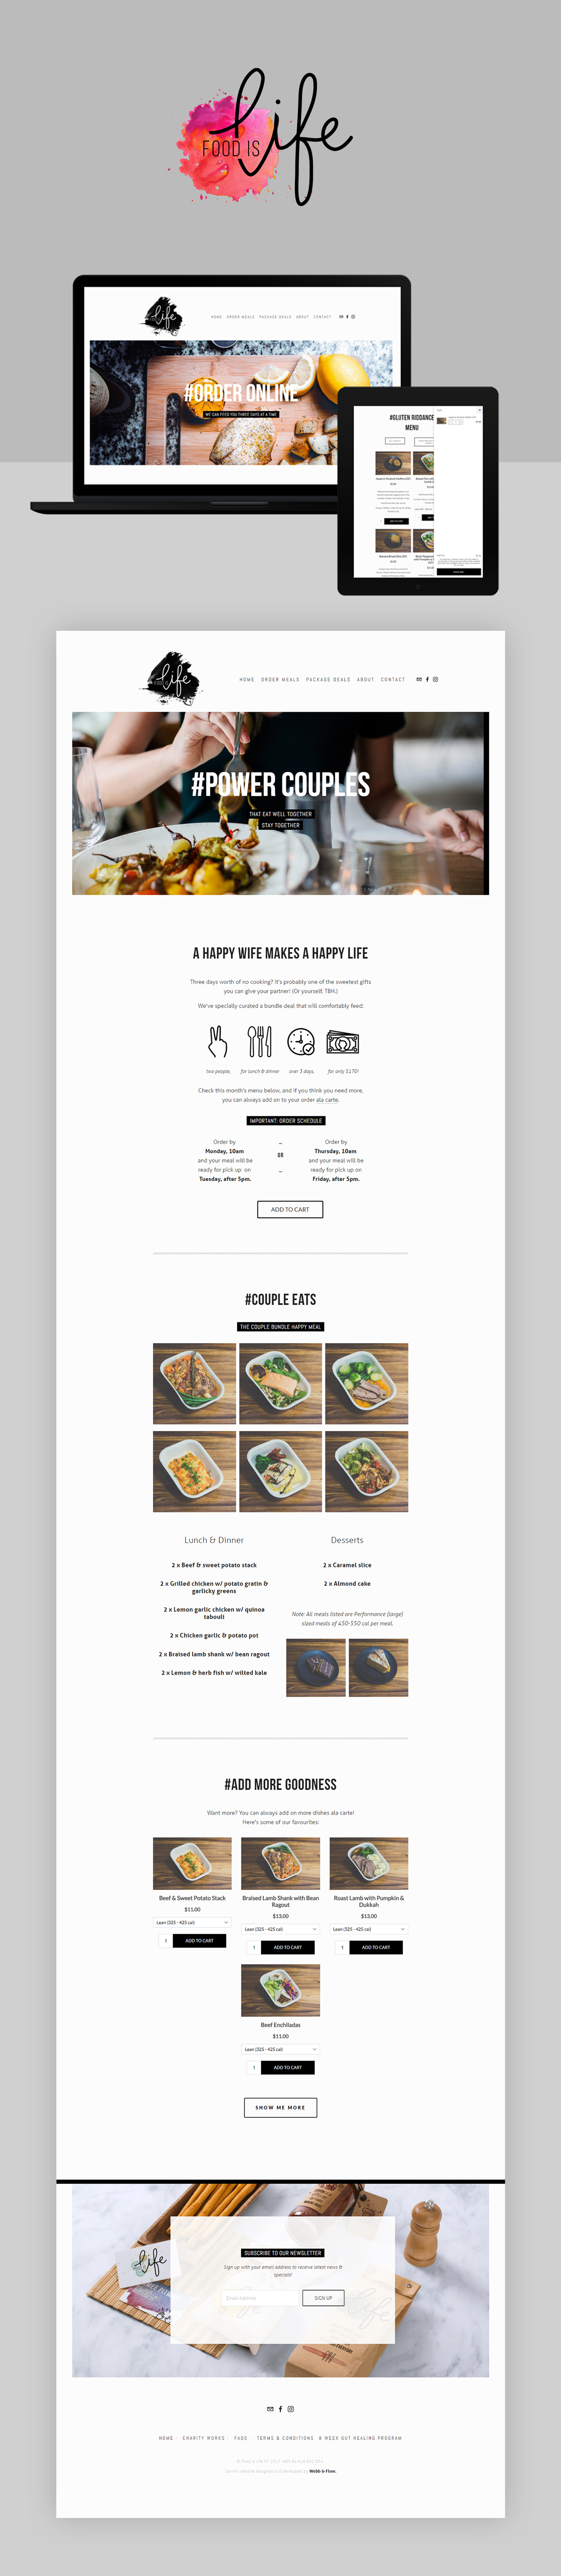 foodislife_full.jpg